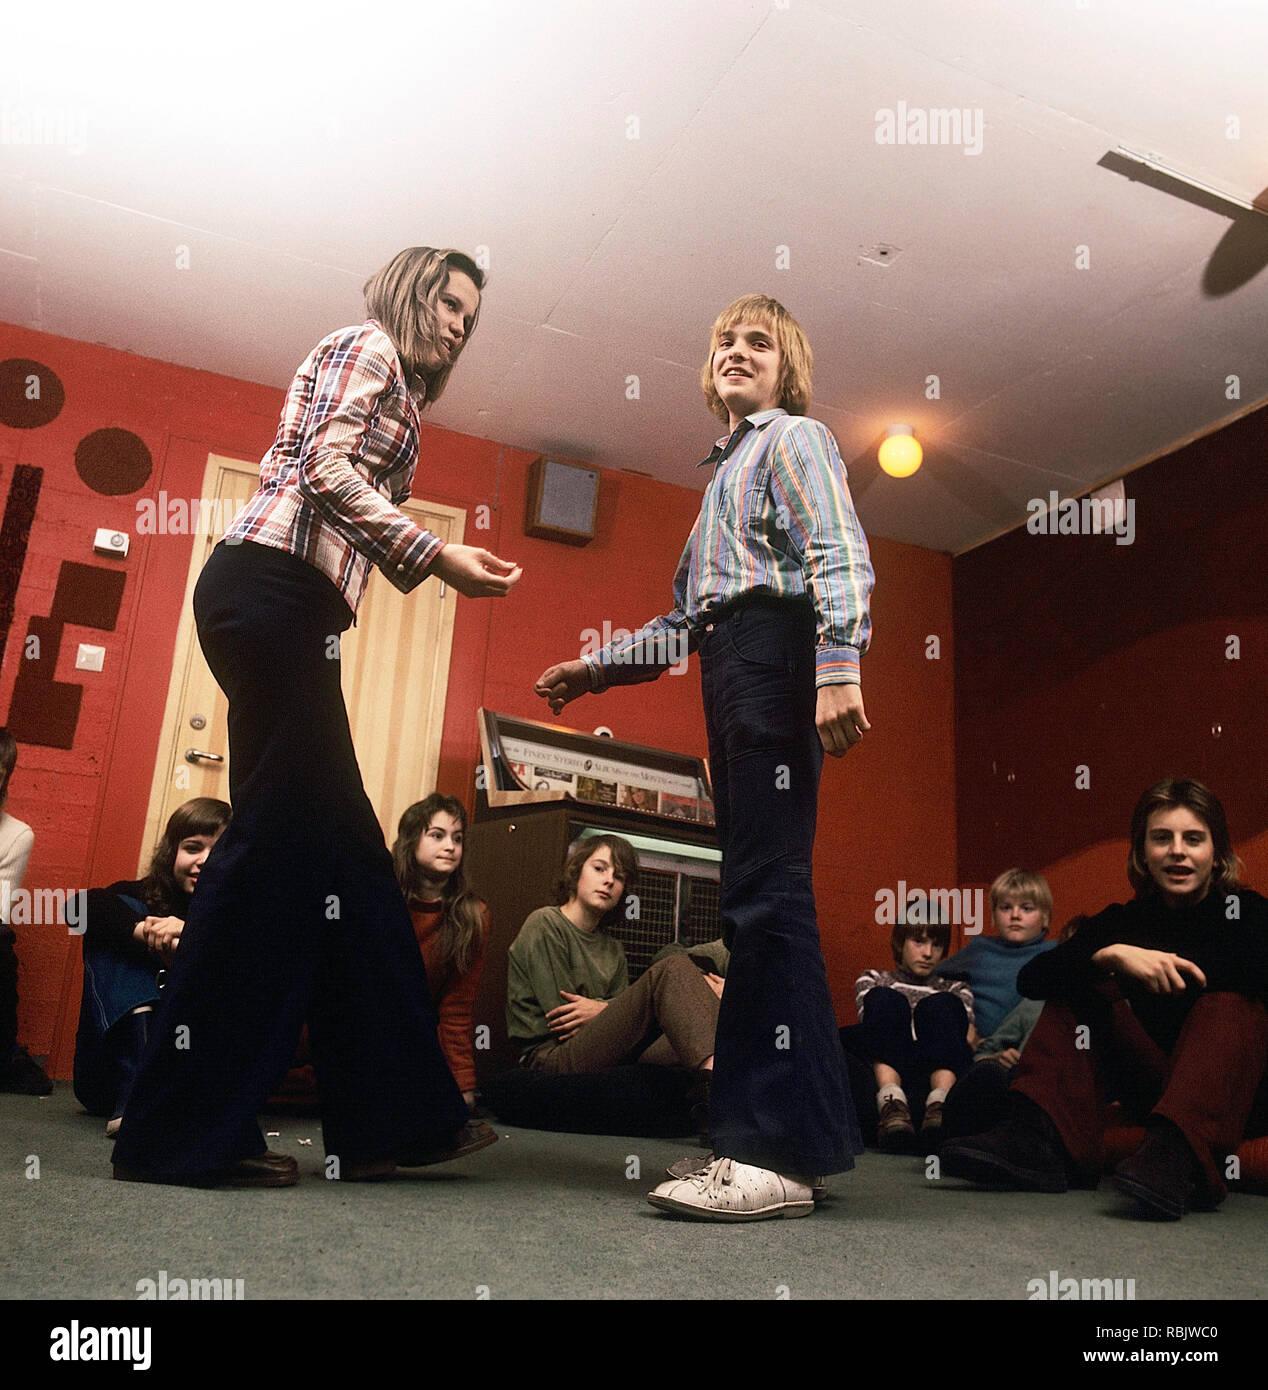 woman jeans 1970s stockfotos woman jeans 1970s bilder alamy. Black Bedroom Furniture Sets. Home Design Ideas